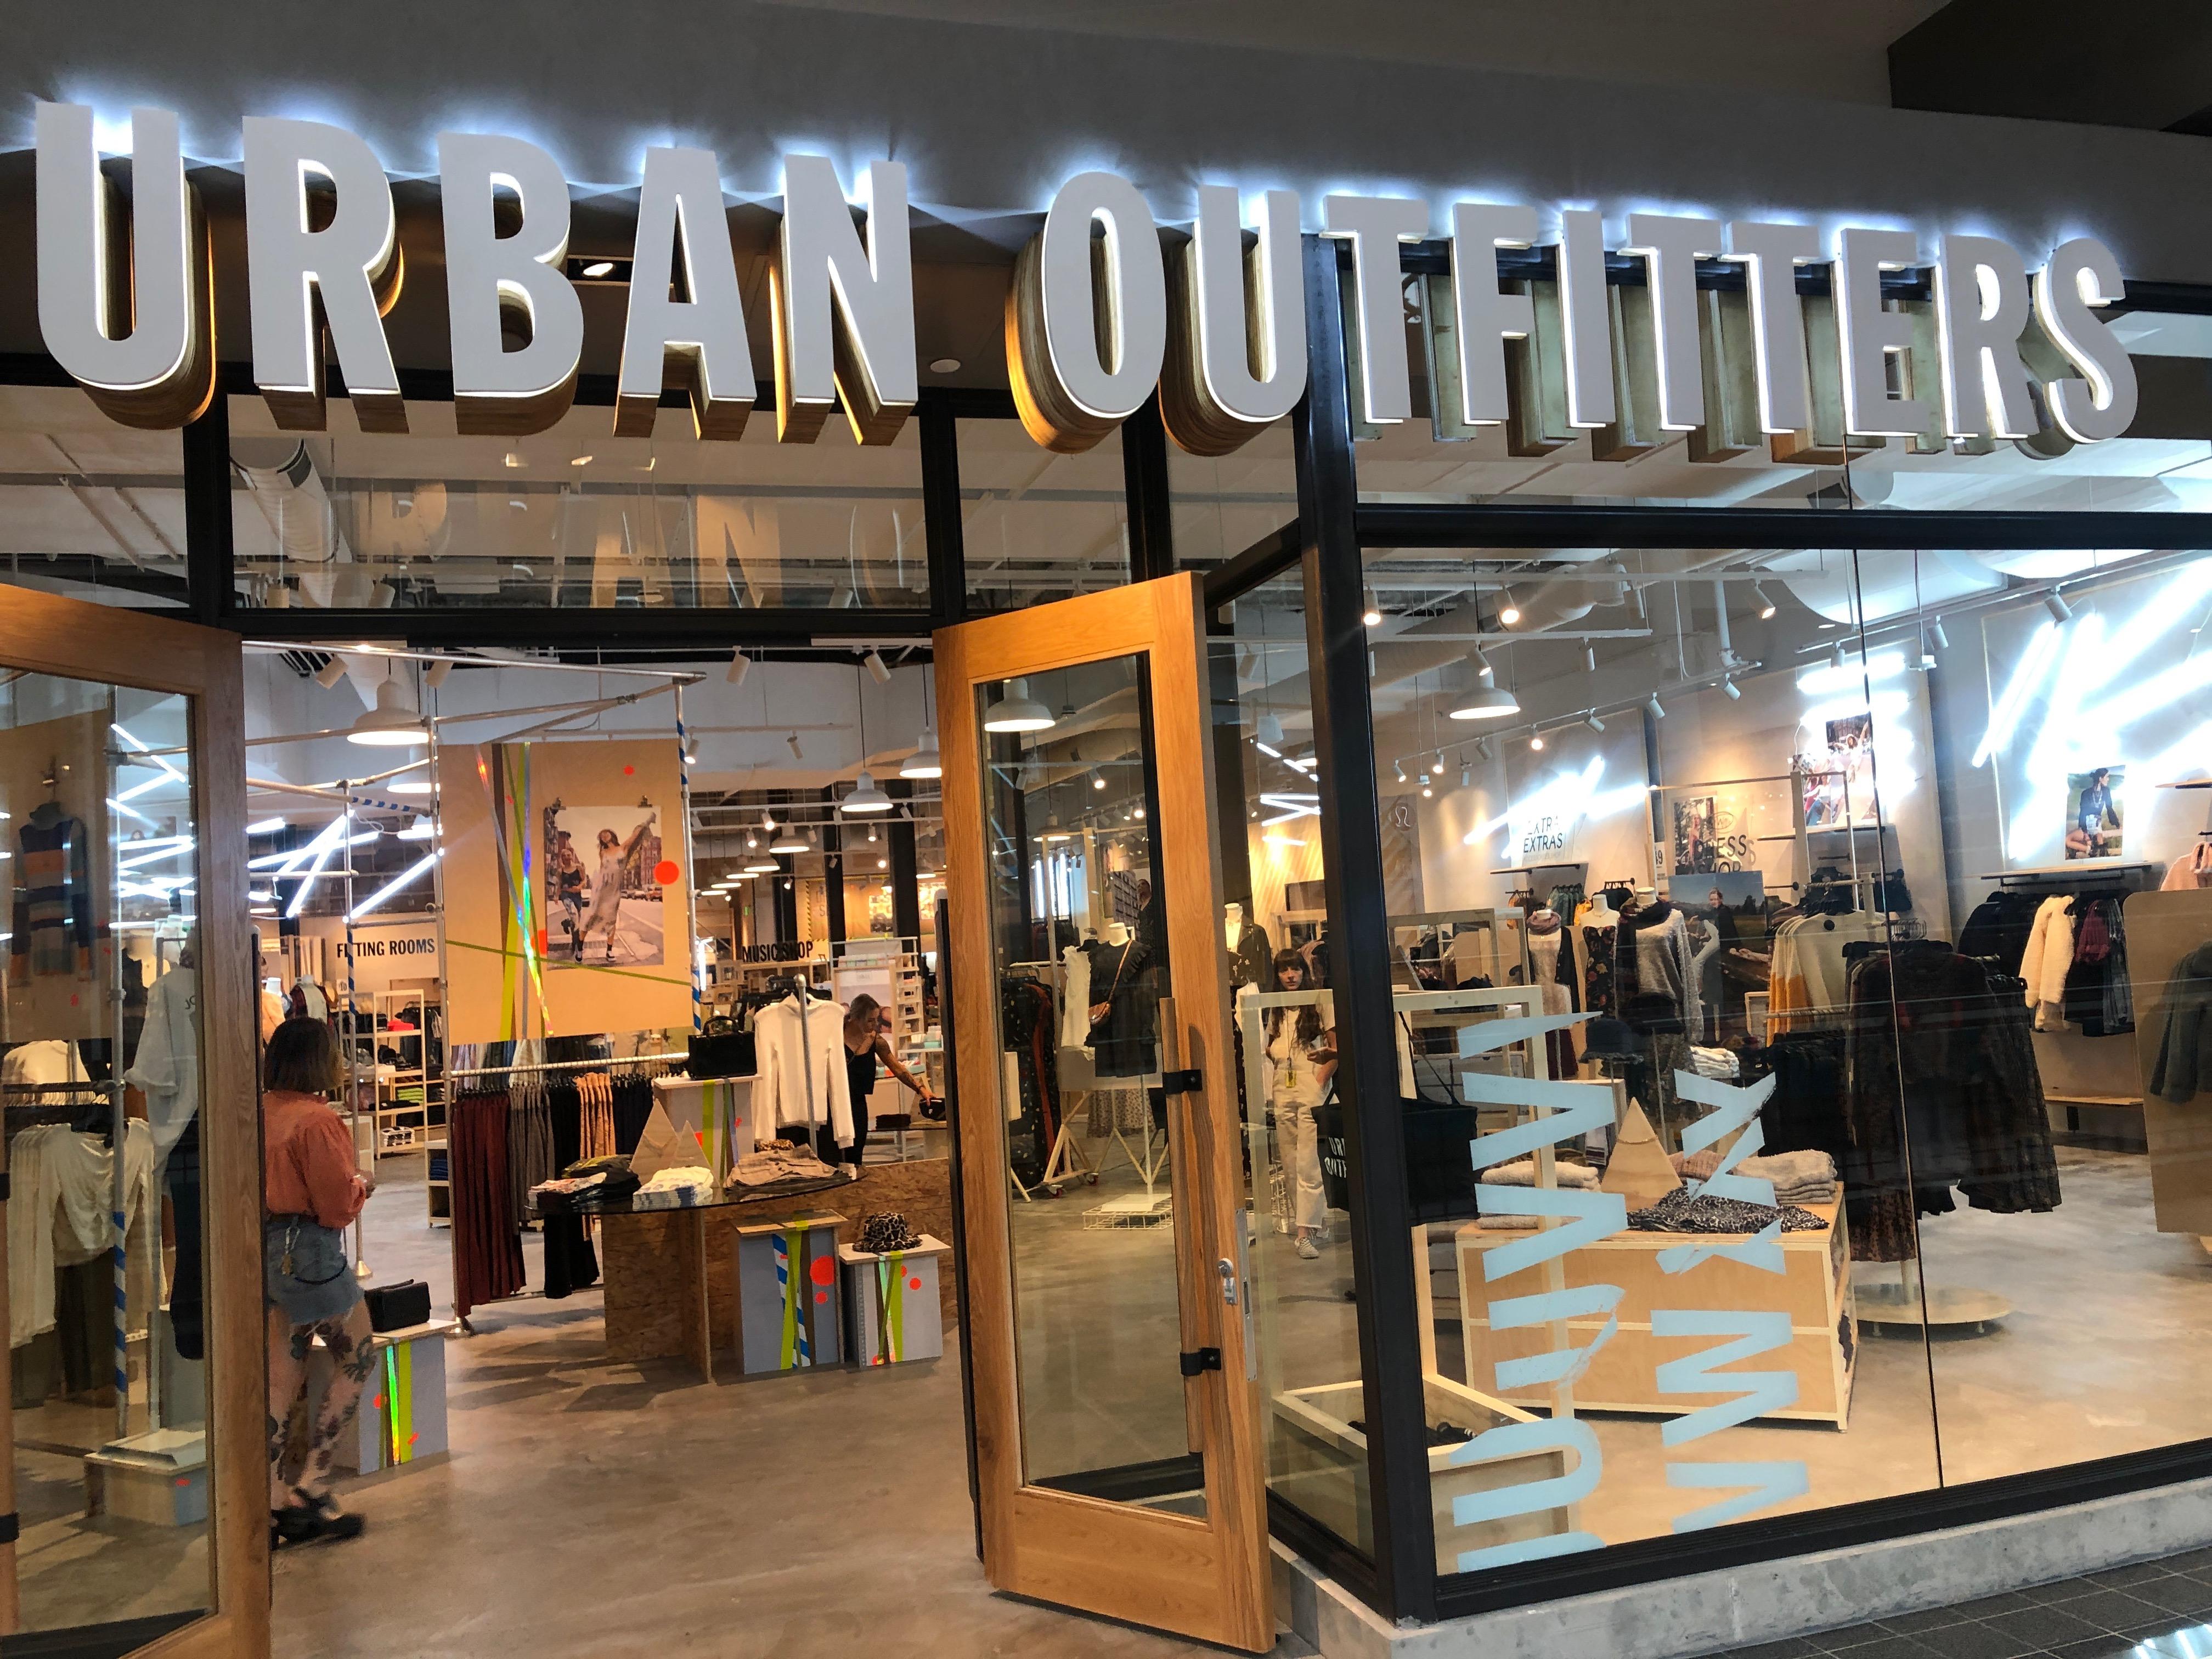 Urban Outfitters Destiny USA